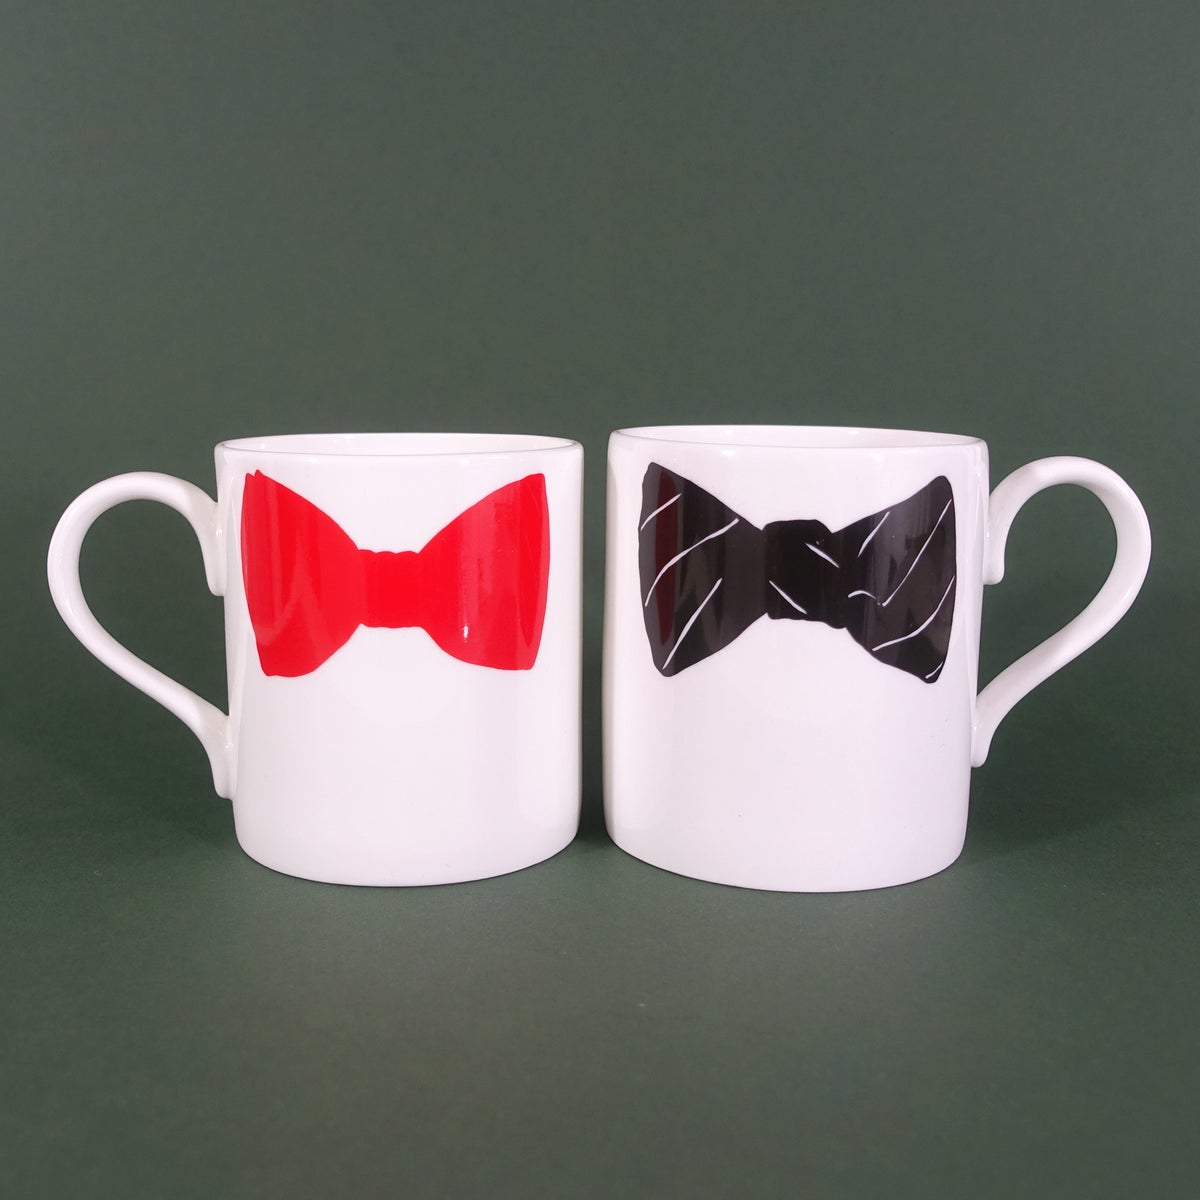 Image of Original Bow Tie Mug - set of two